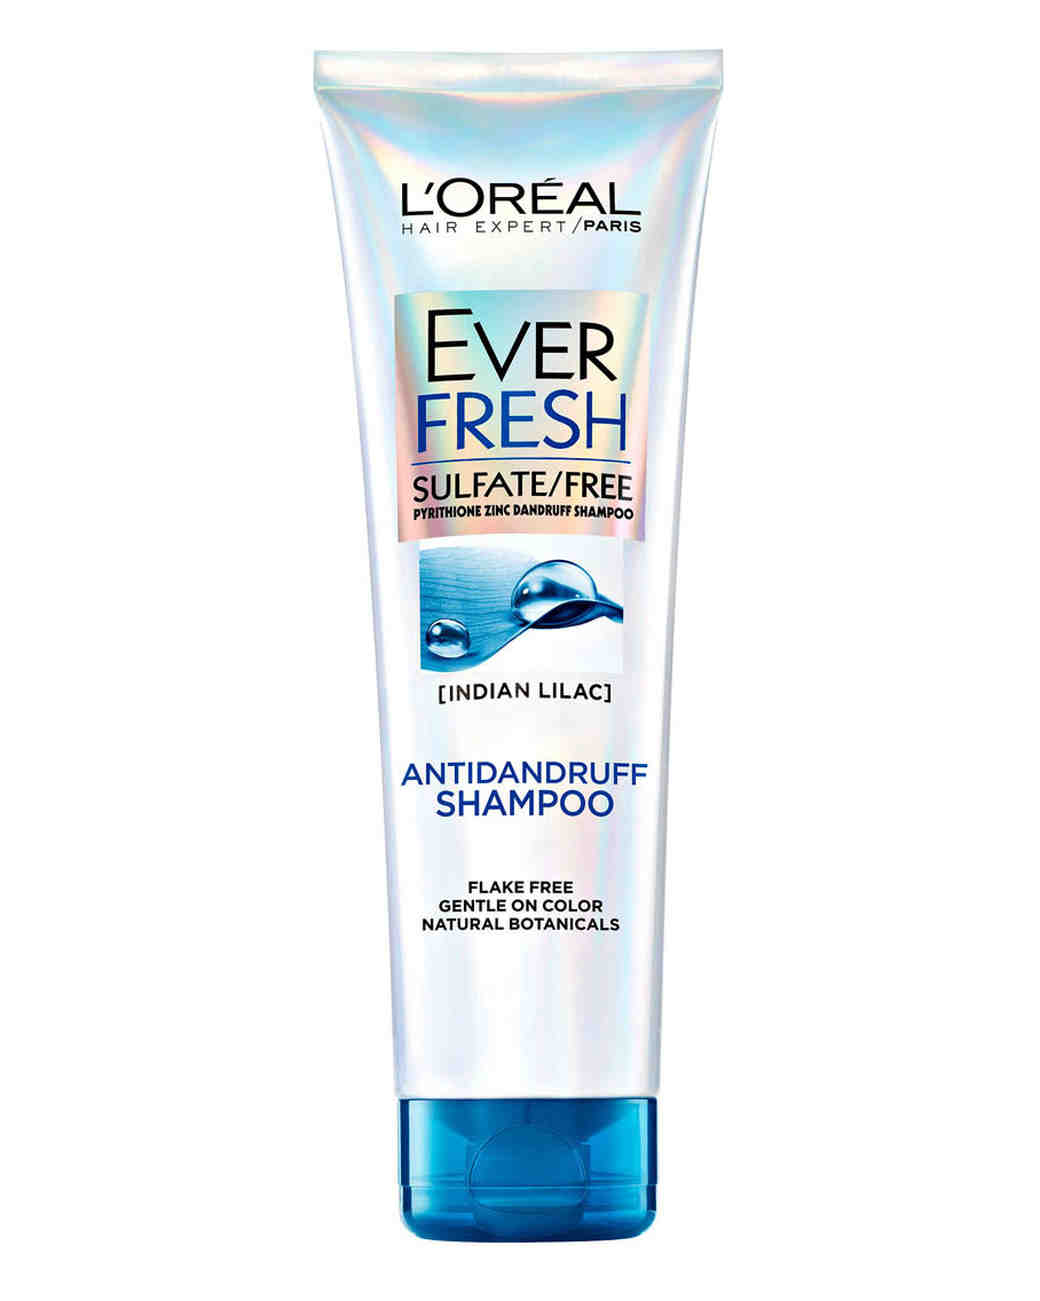 loreal ever fresh antidandruff